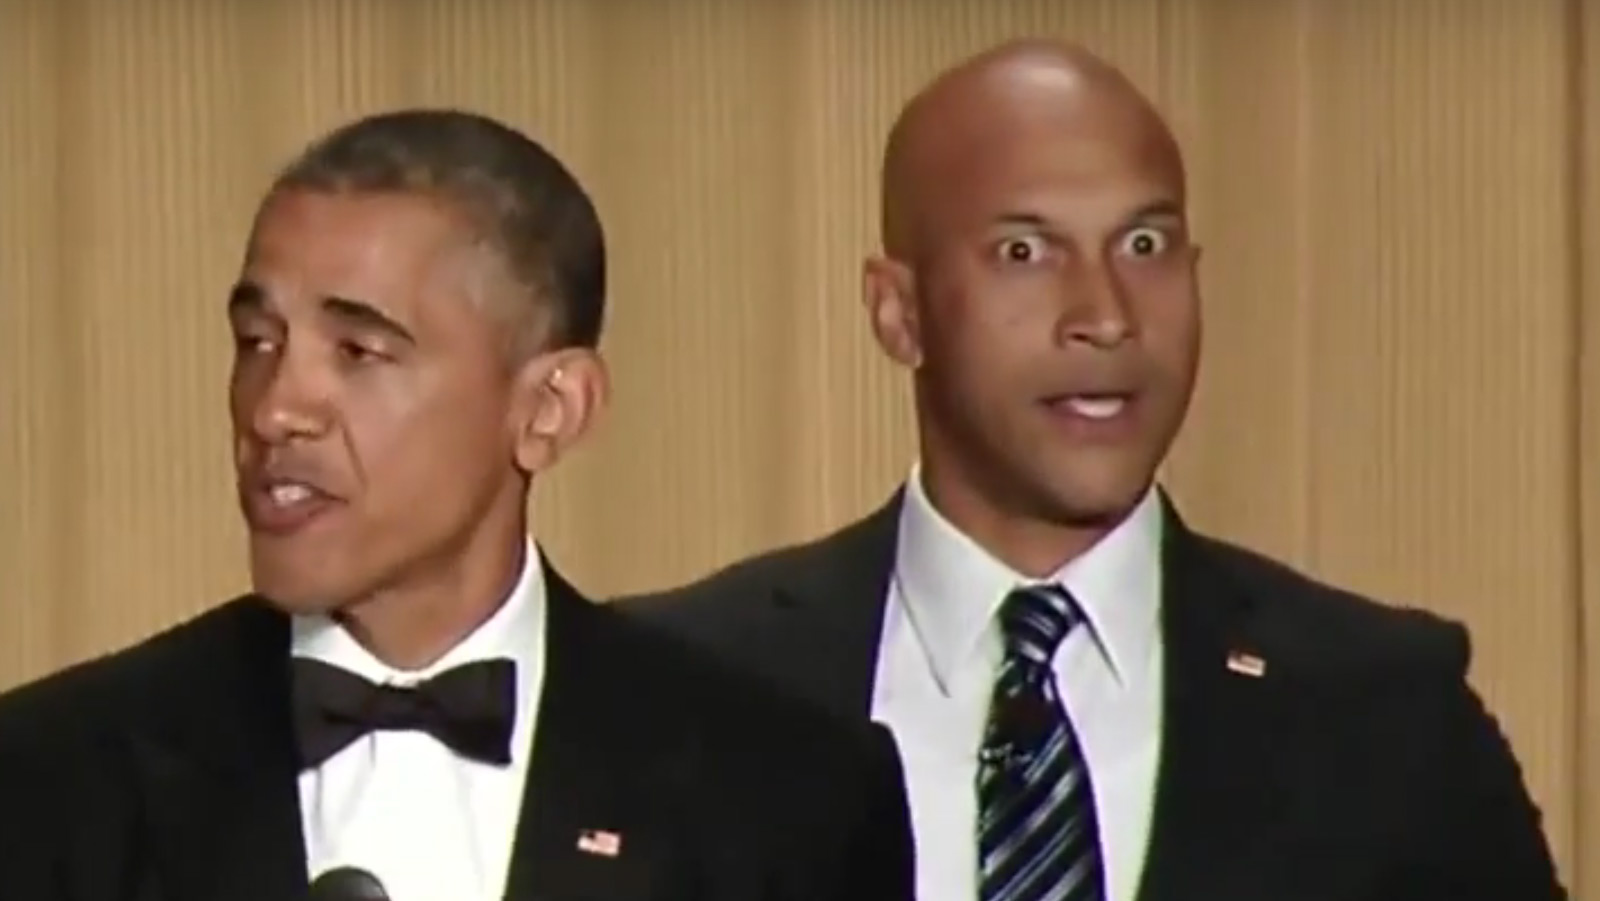 Obama's Anger Translator at the 2015 Correspondents' Dinner